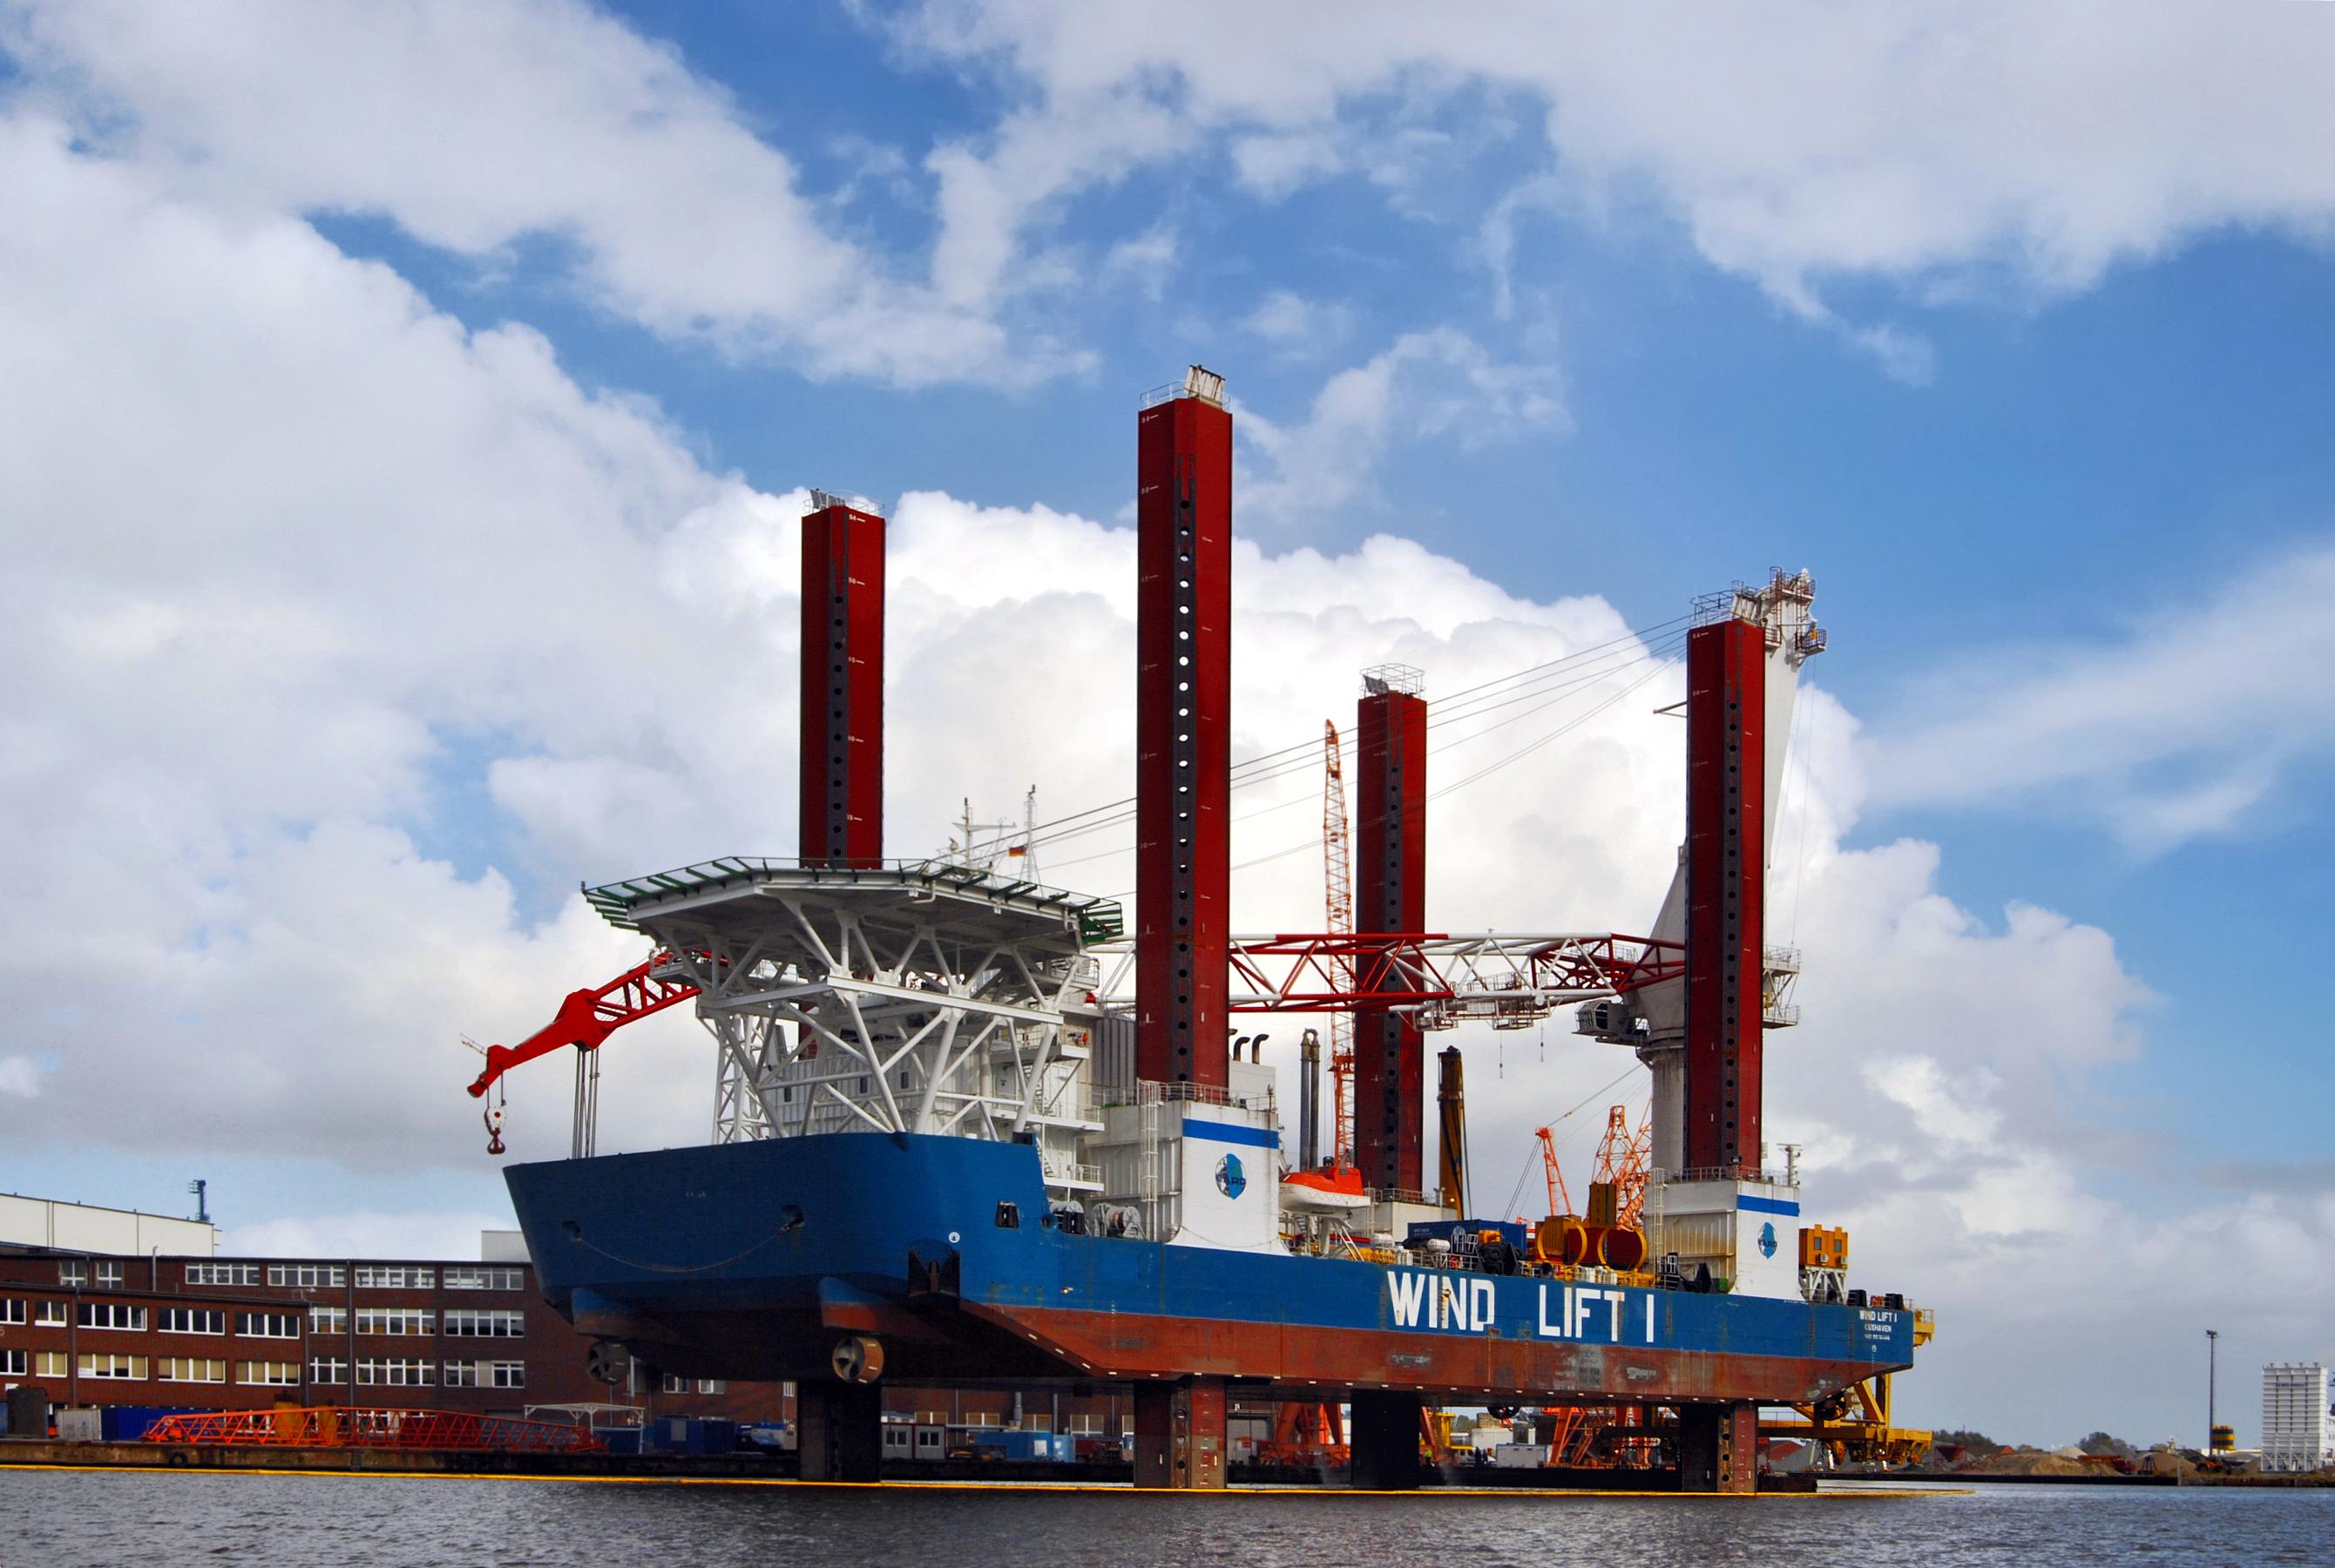 Crane vessel - Wikipedia